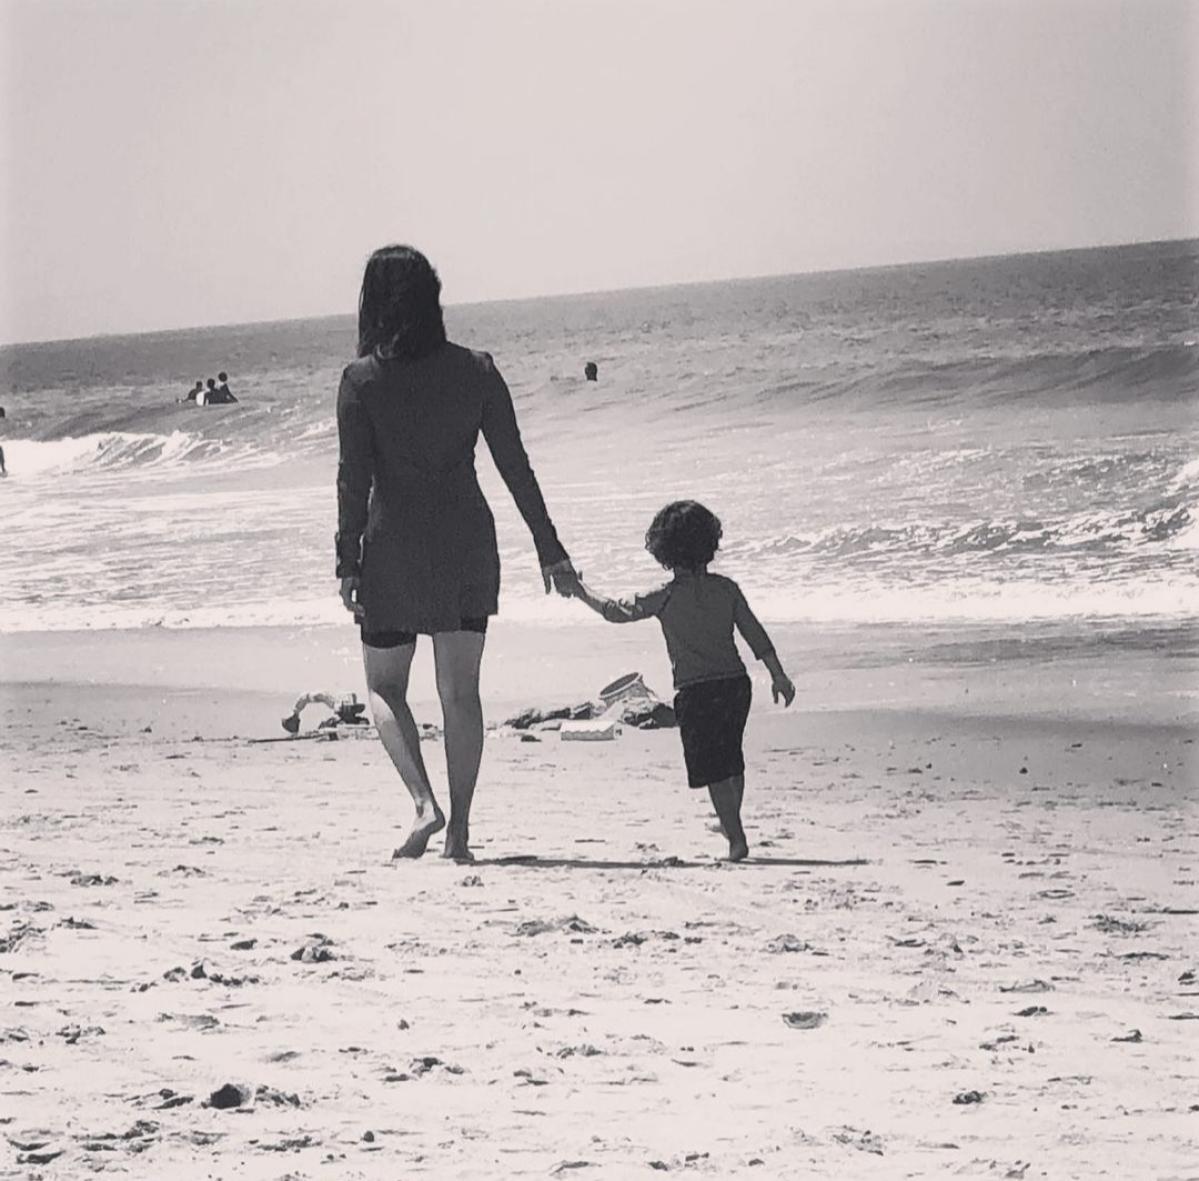 Beach days with Sunny and Noah